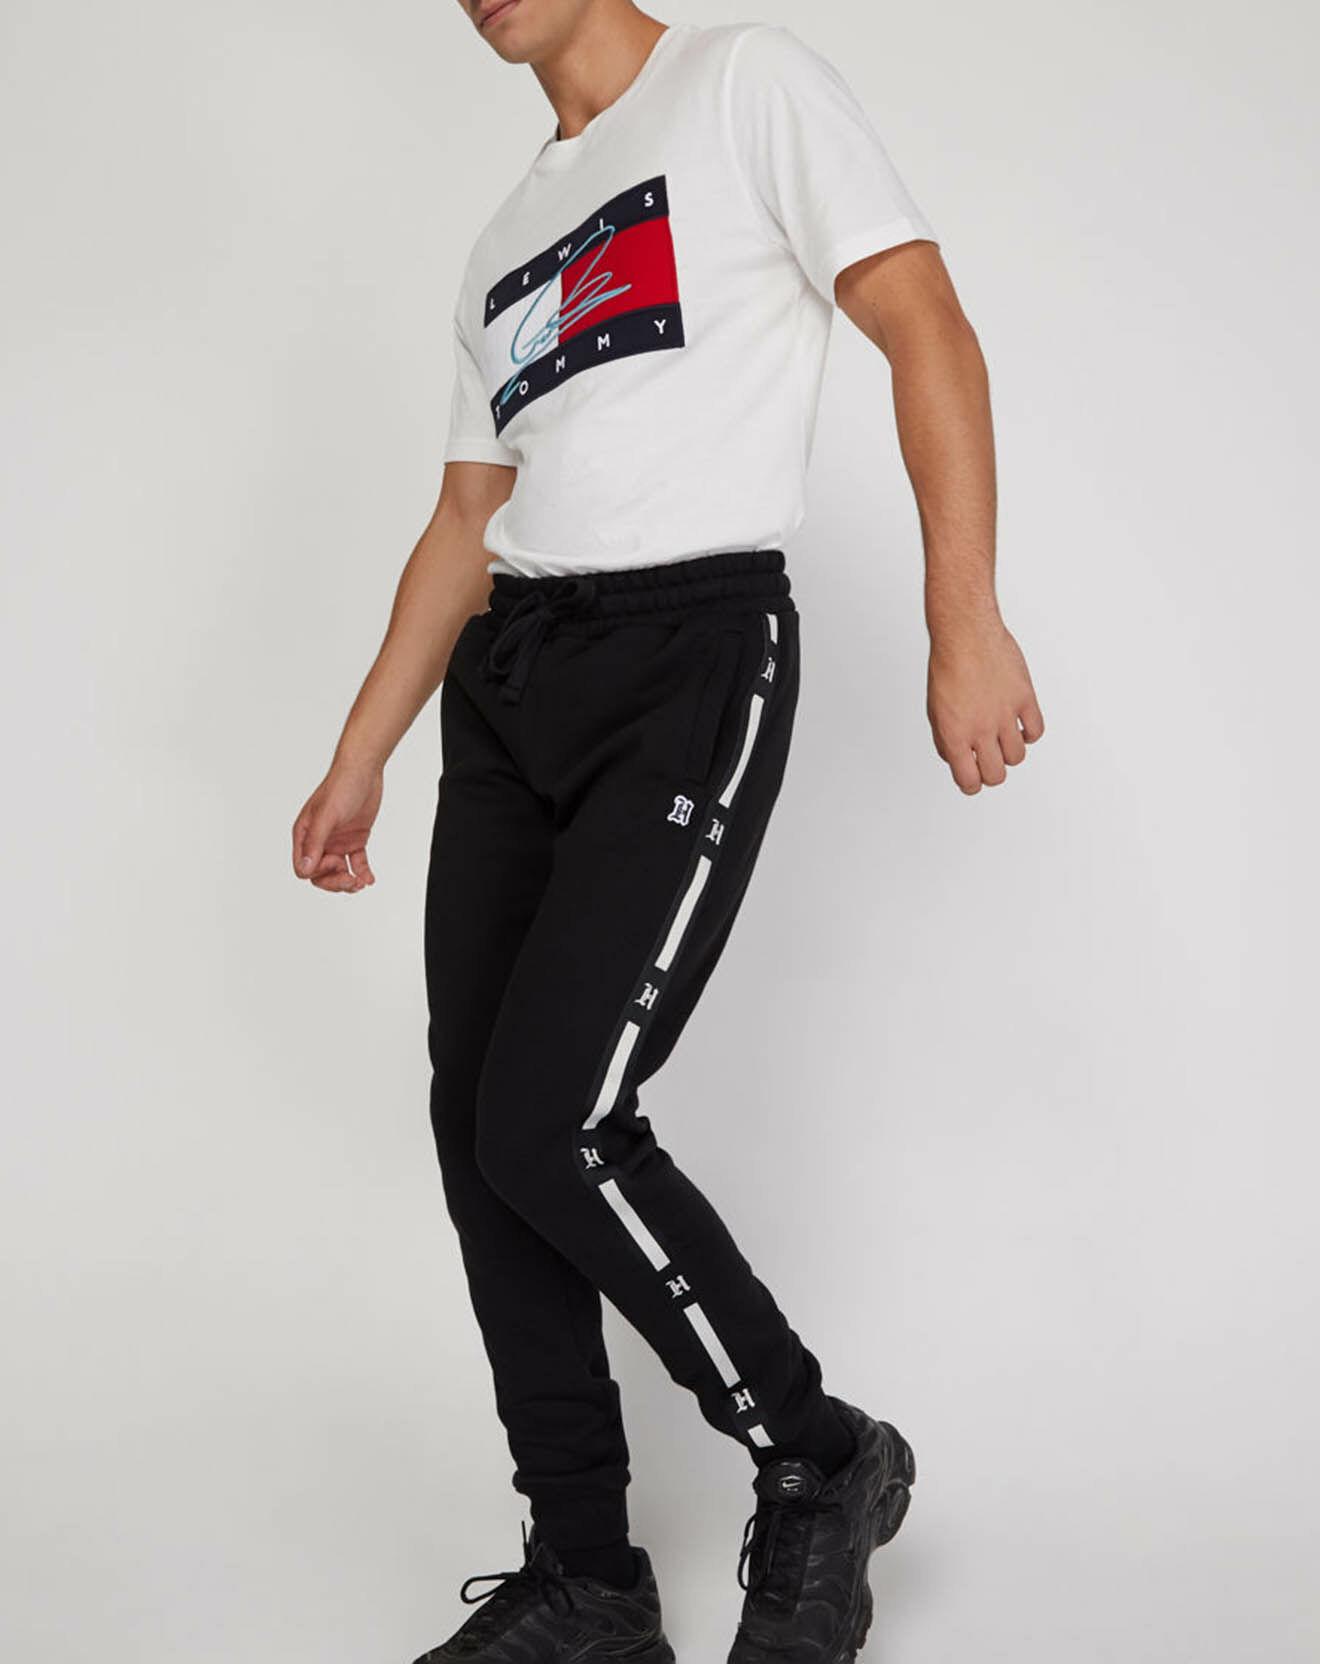 Jogging bande Lewis Hamilton x noir - Tommy Hilfiger - Modalova